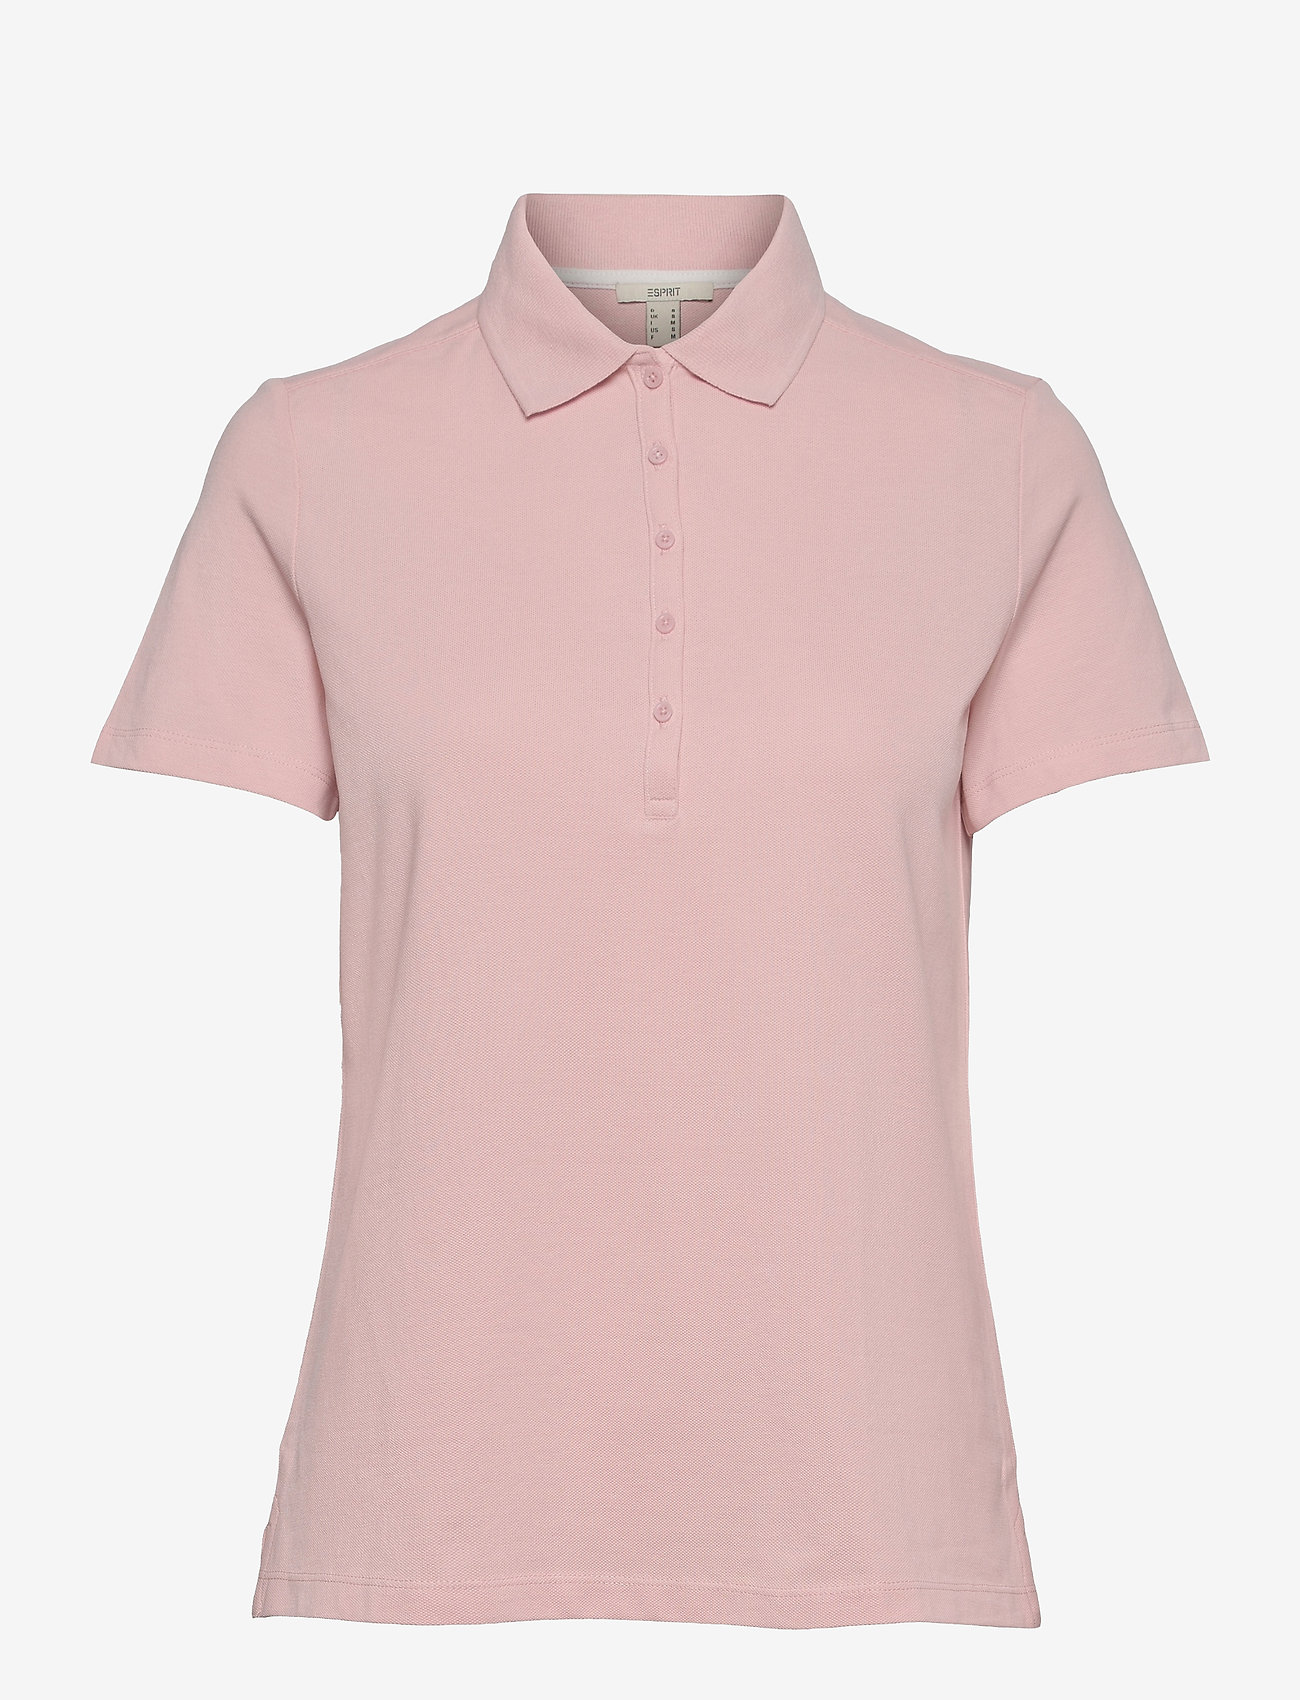 Esprit Casual - T-Shirts - polohemden - nude - 0